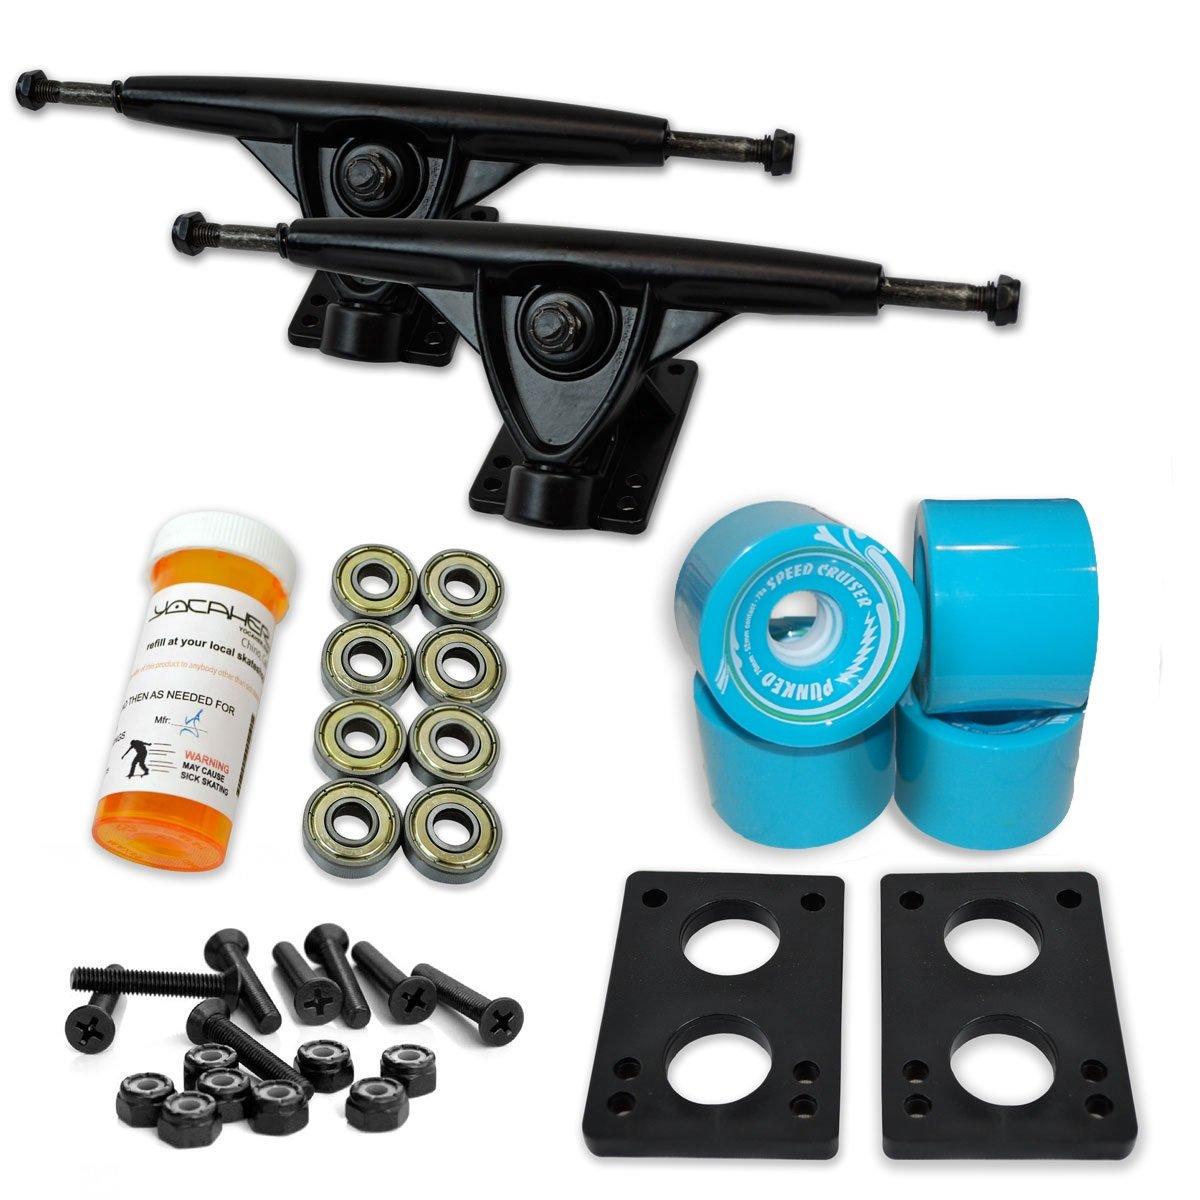 Yocaher Longboard Skateboard Trucks Combo Set w/ 71mm Wheels + 9.675'' Polished/Black Trucks Package (Baby Blue, Polished Trucks) by Yocaher